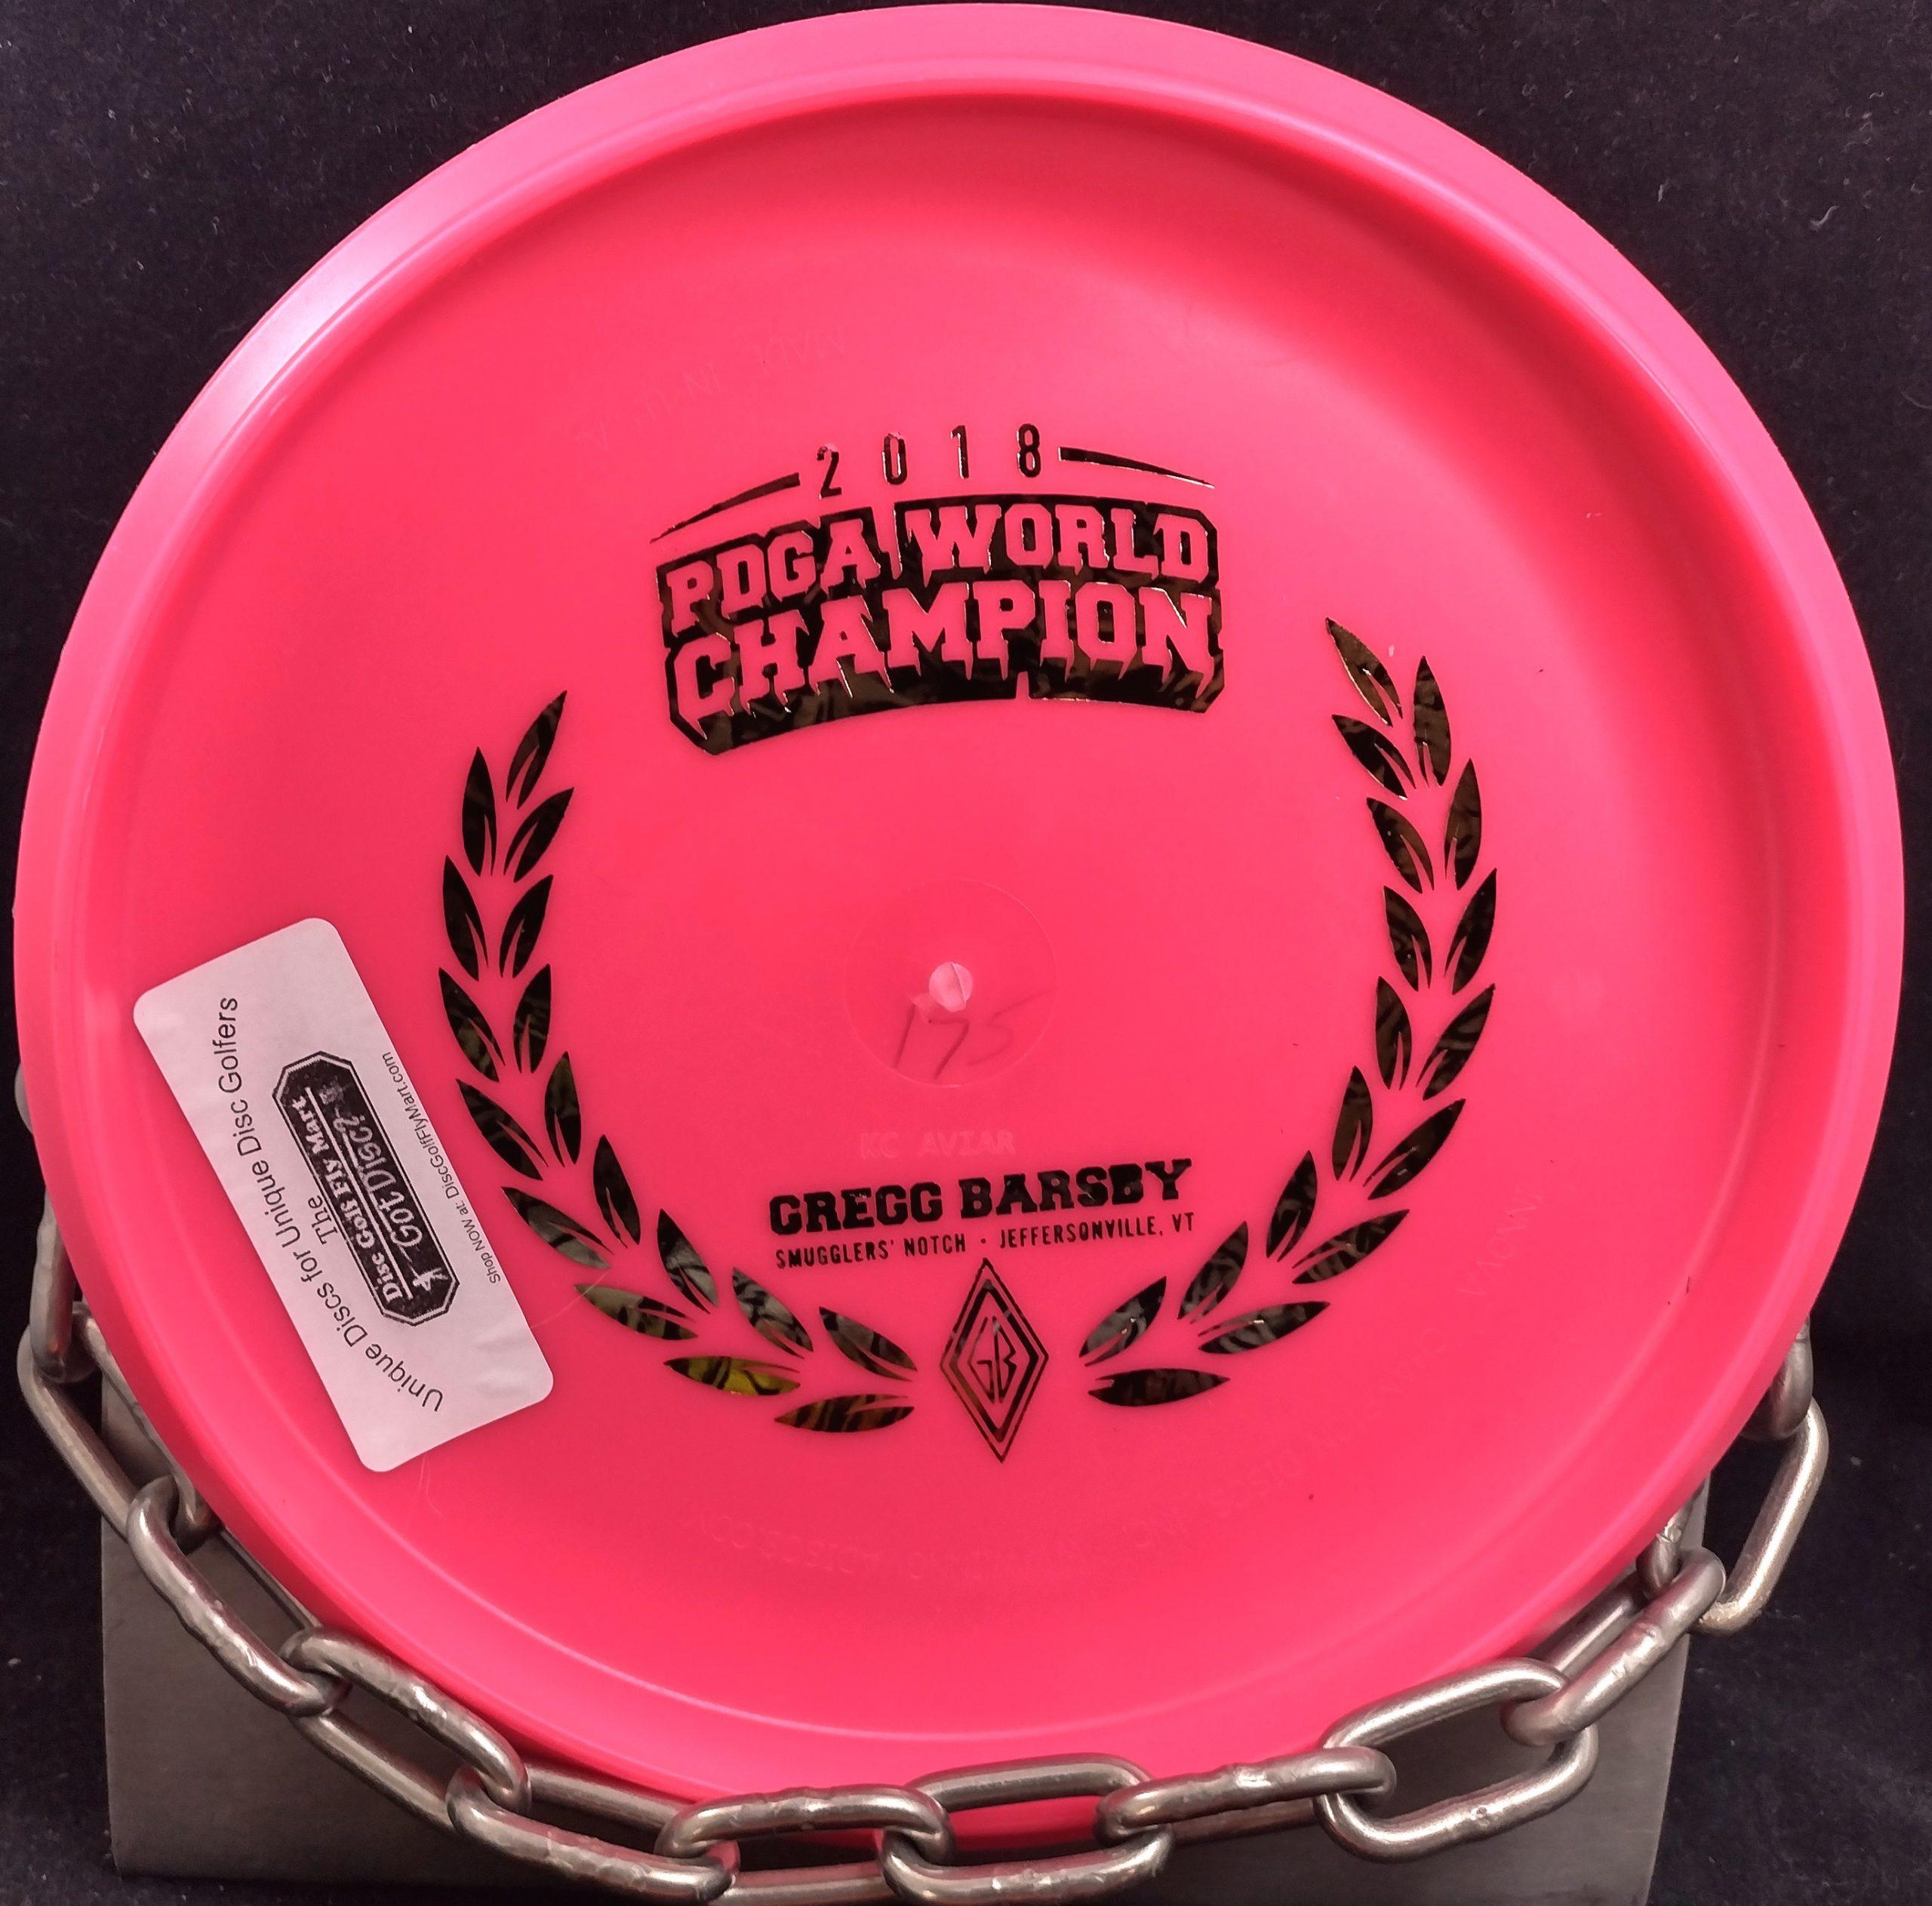 Innova Gregg Barsby 2018 World Champion Commemorative KC Pro Aviar Big Bead Putter Golf Disc